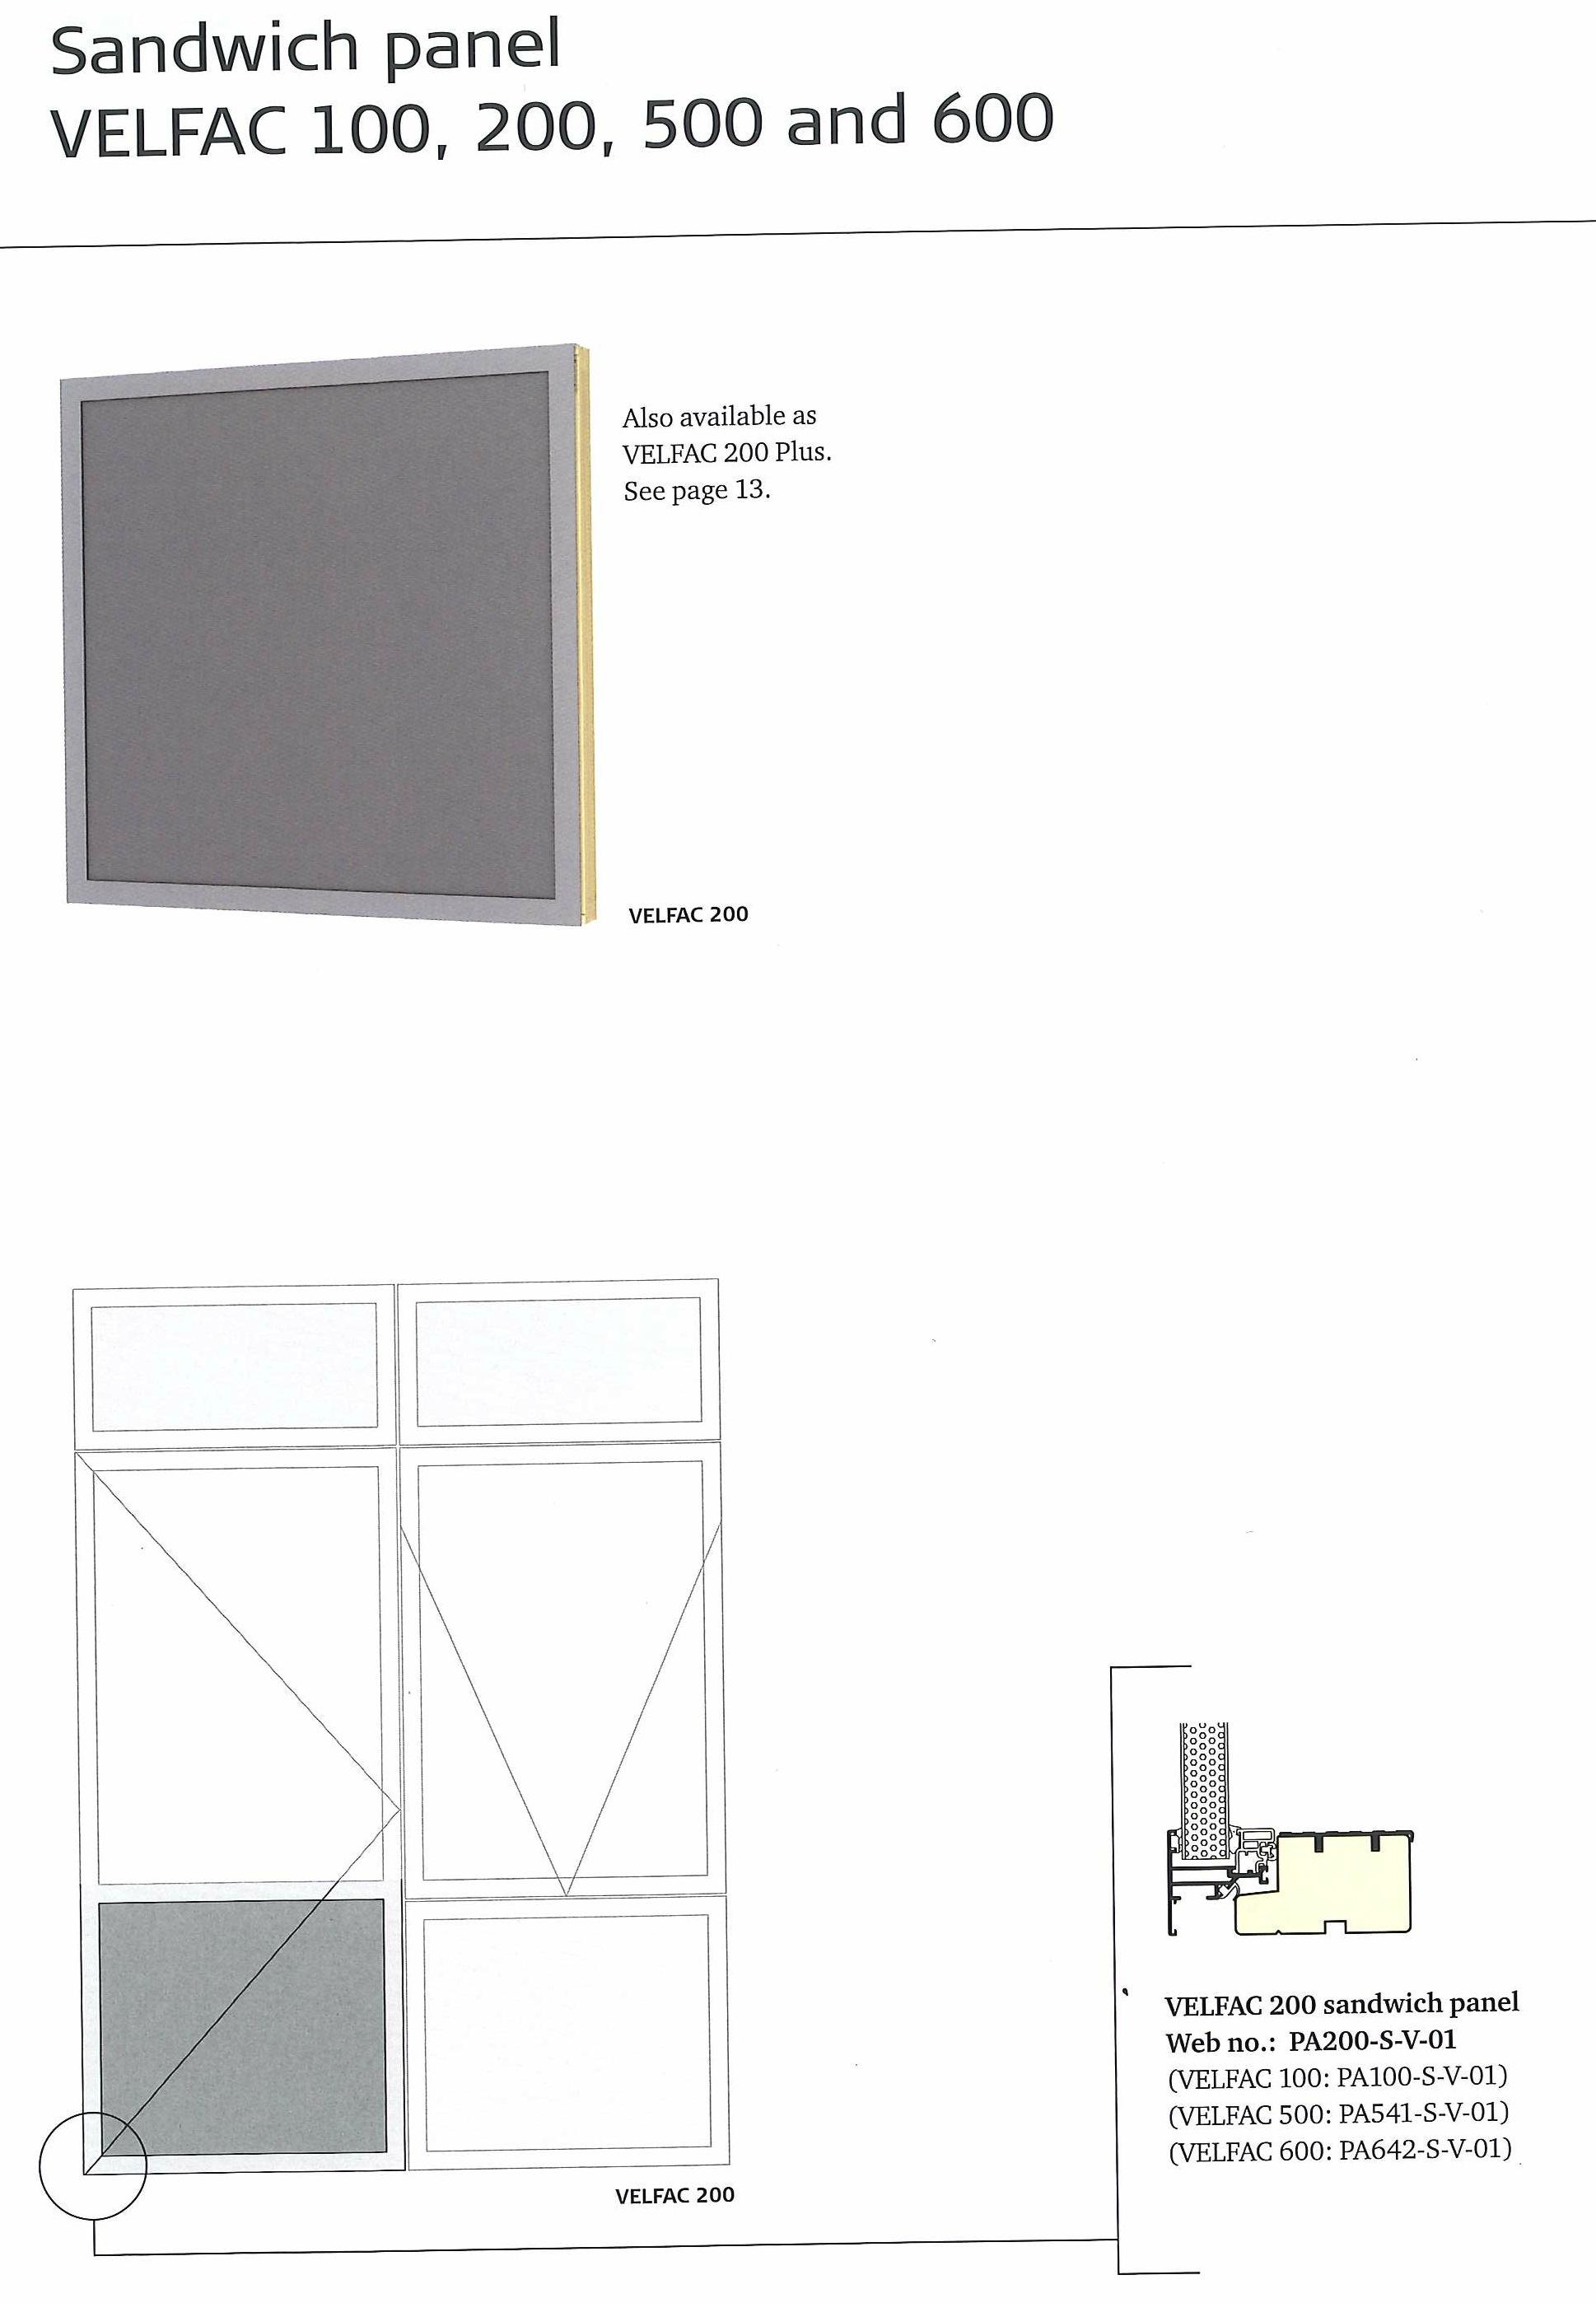 insulated-panel.jpg.0fc589701e677cdac88207a5db9cfee9.jpg